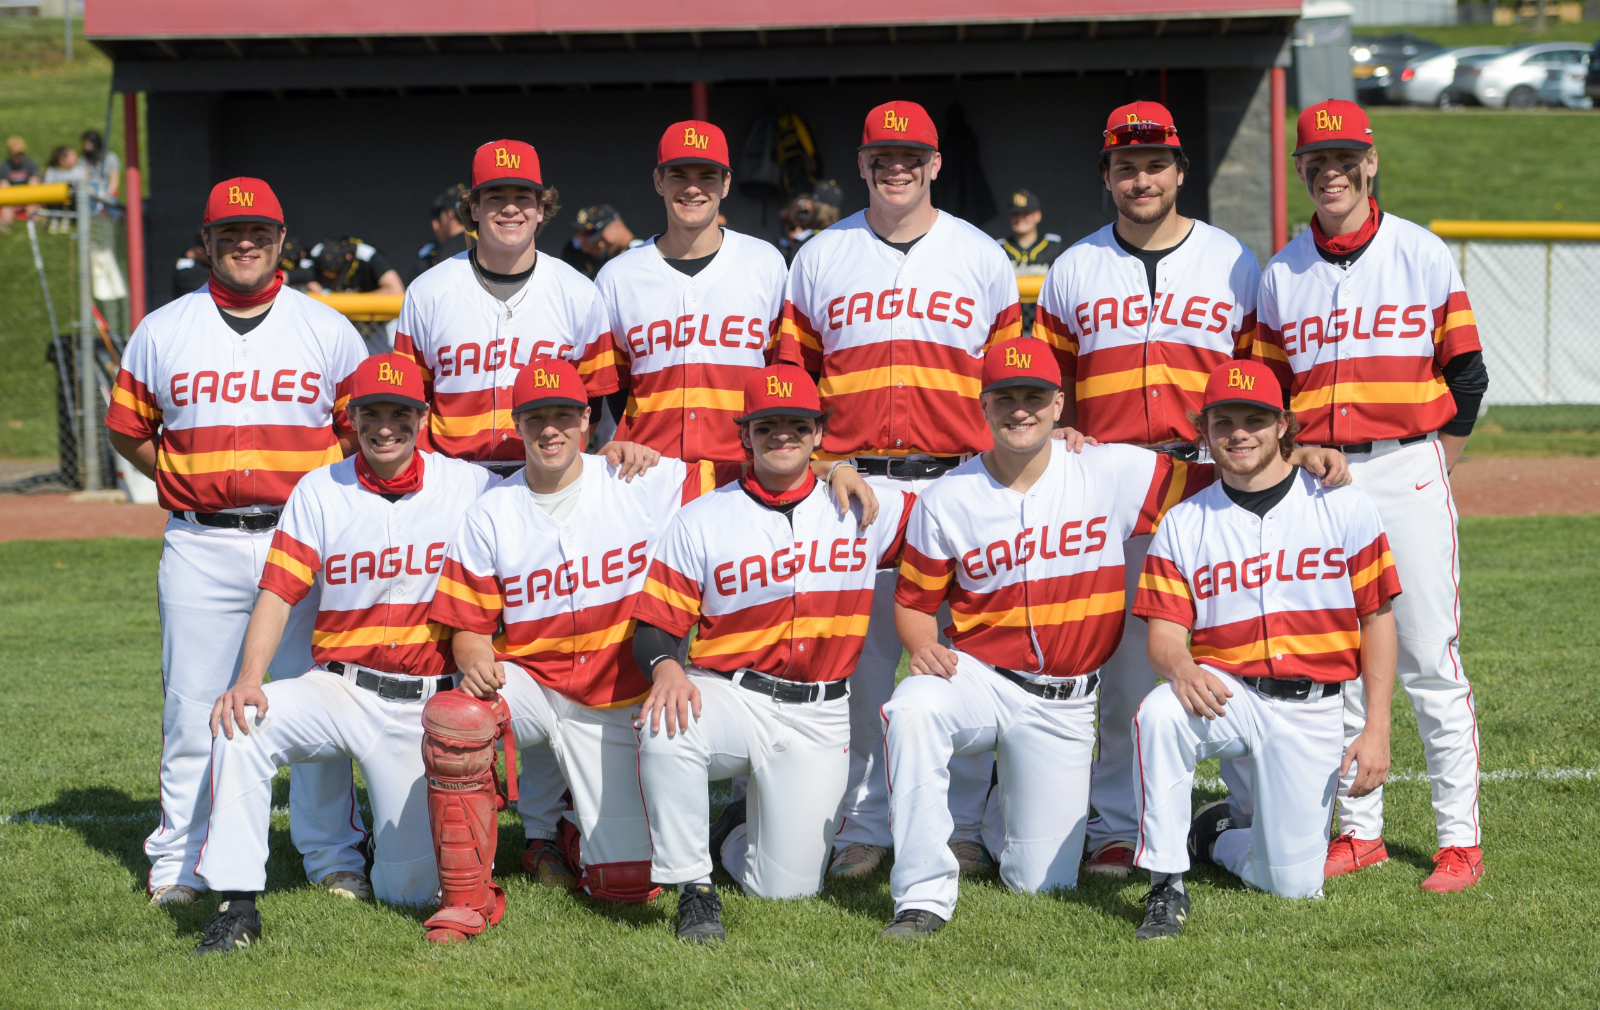 PHOTO GALLERY: Big Walnut baseball team defeats Franklin Heights 11-1